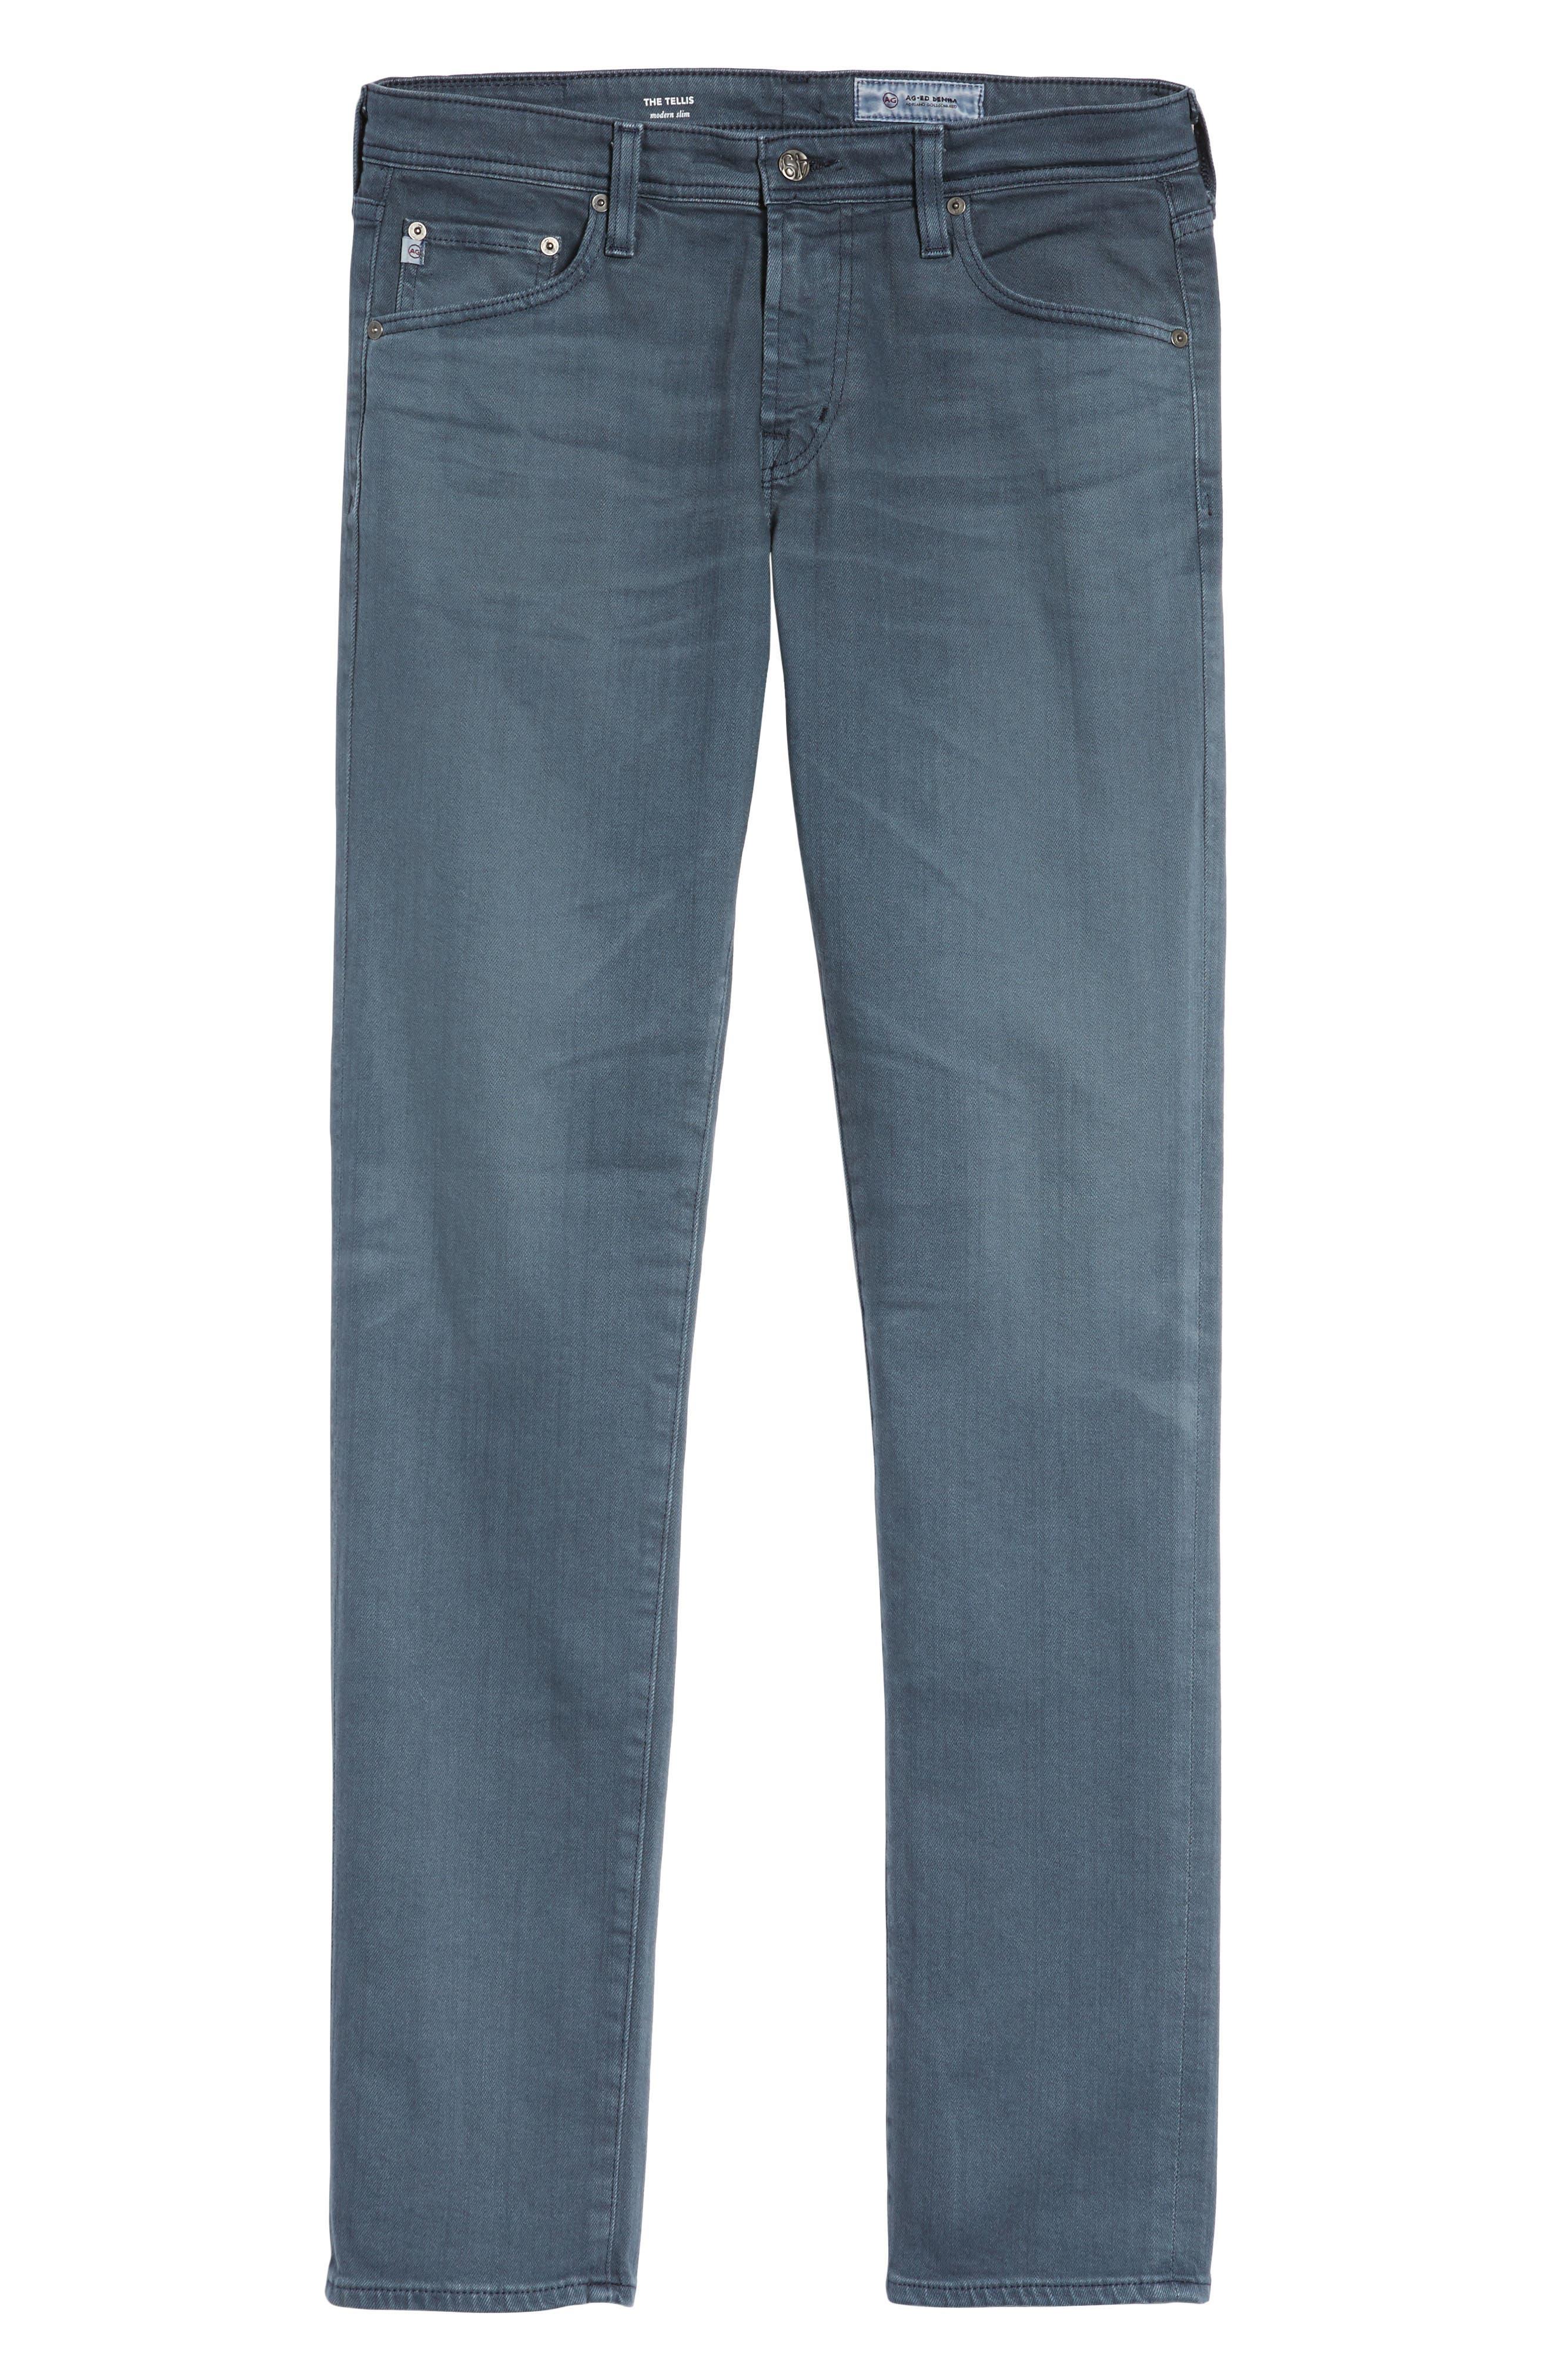 Tellis Slim Fit Jeans,                             Alternate thumbnail 6, color,                             425